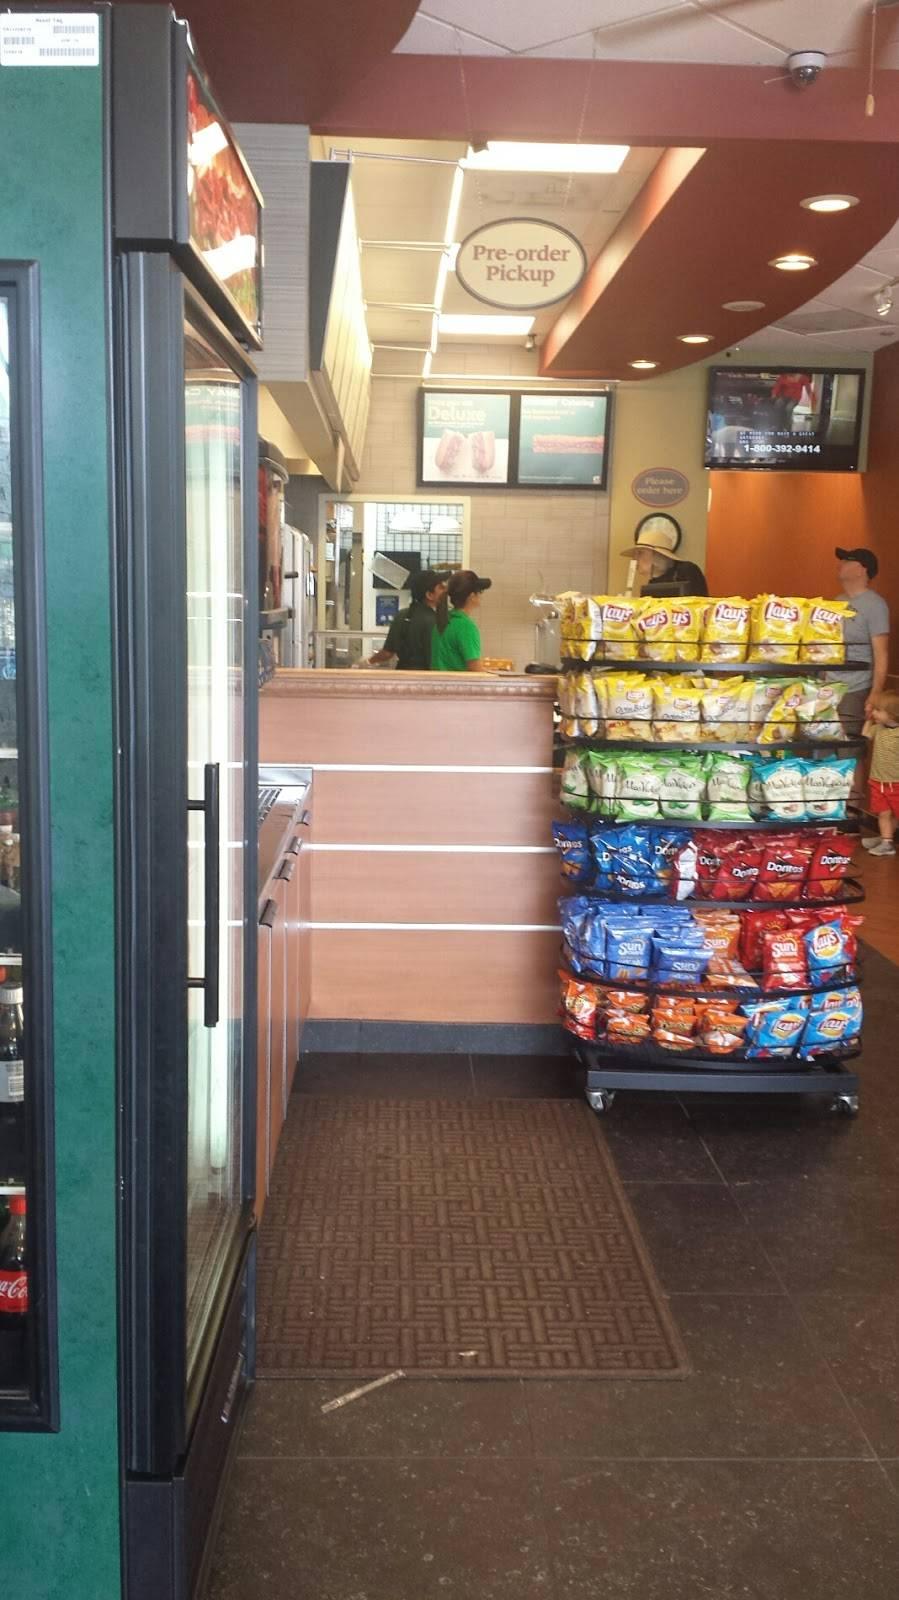 Subway Restaurants   restaurant   1474 North Point Dr, Reston, VA 20194, USA   5713131732 OR +1 571-313-1732